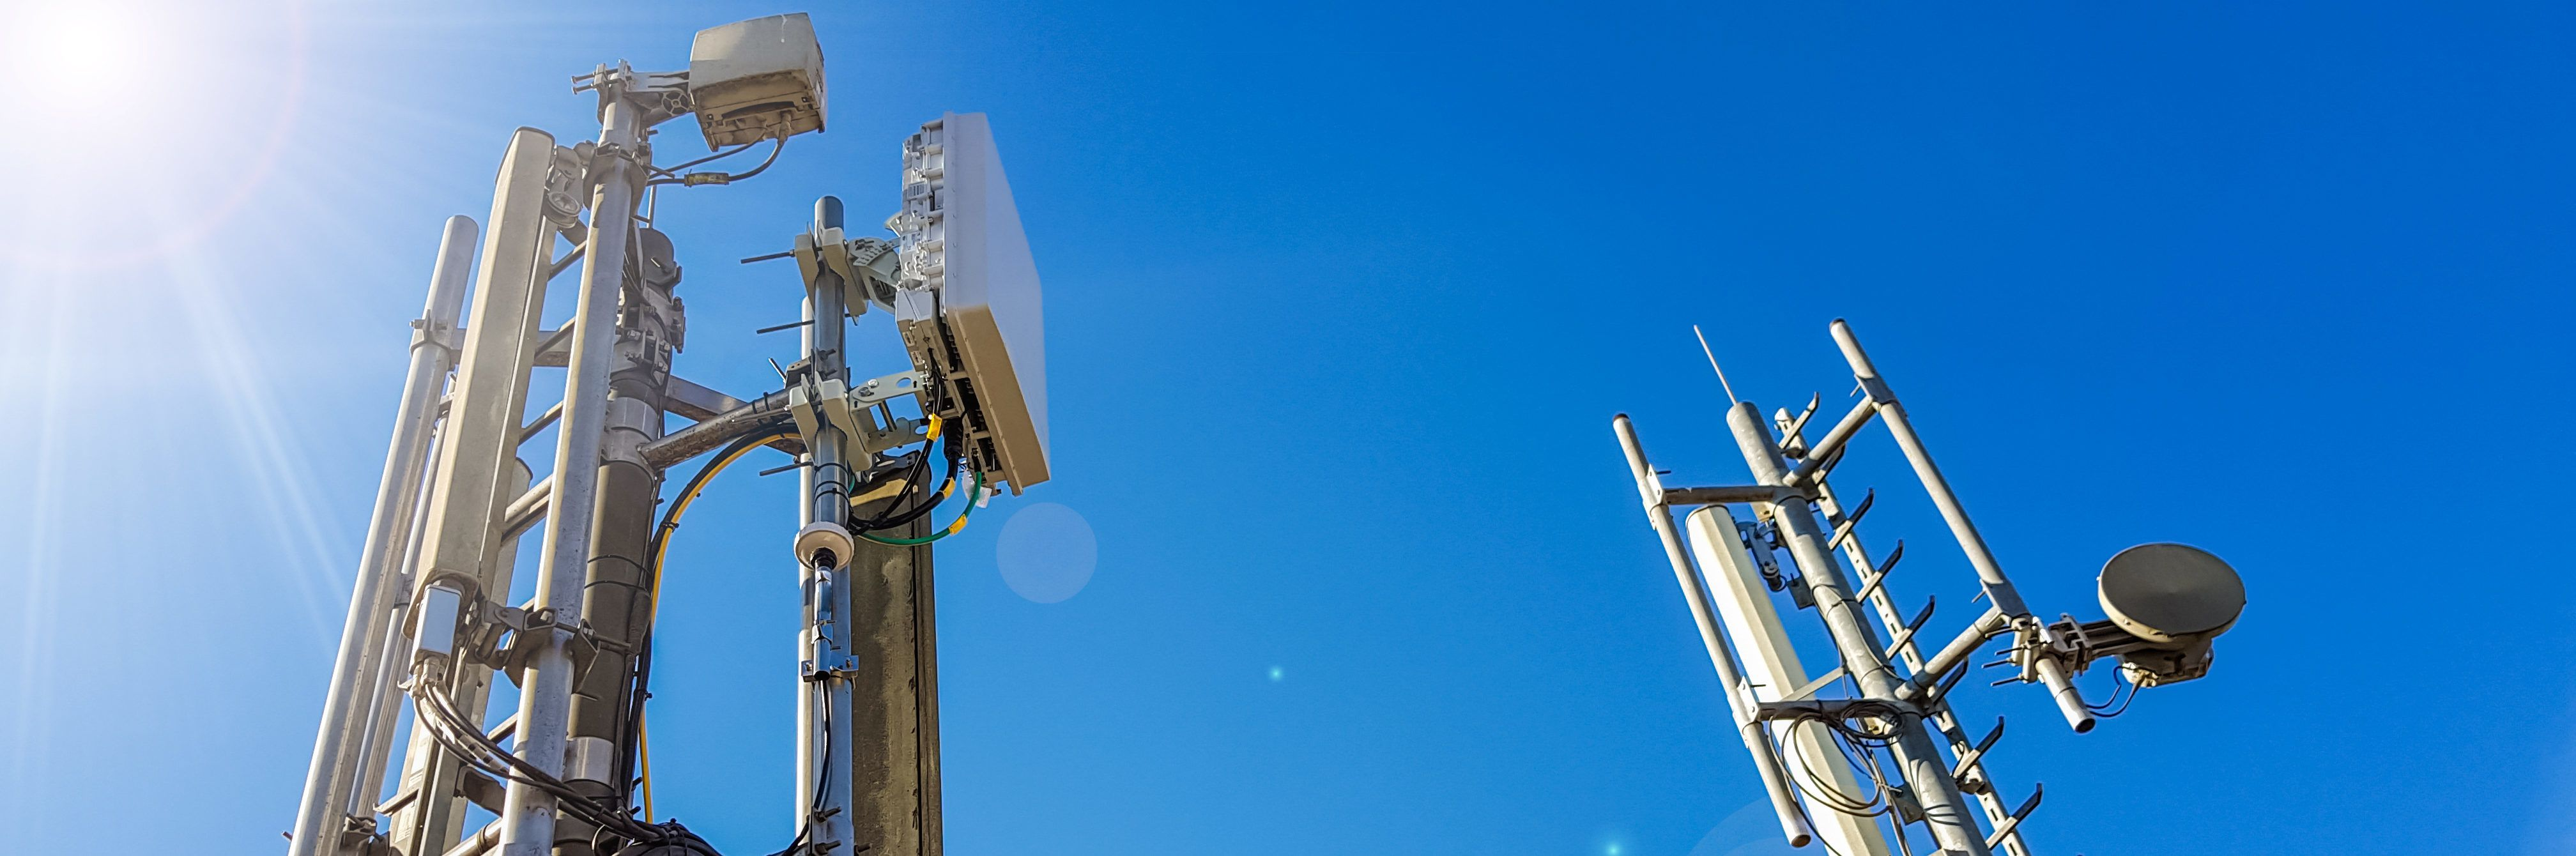 telco, telecom, 5G, network, telecommunications